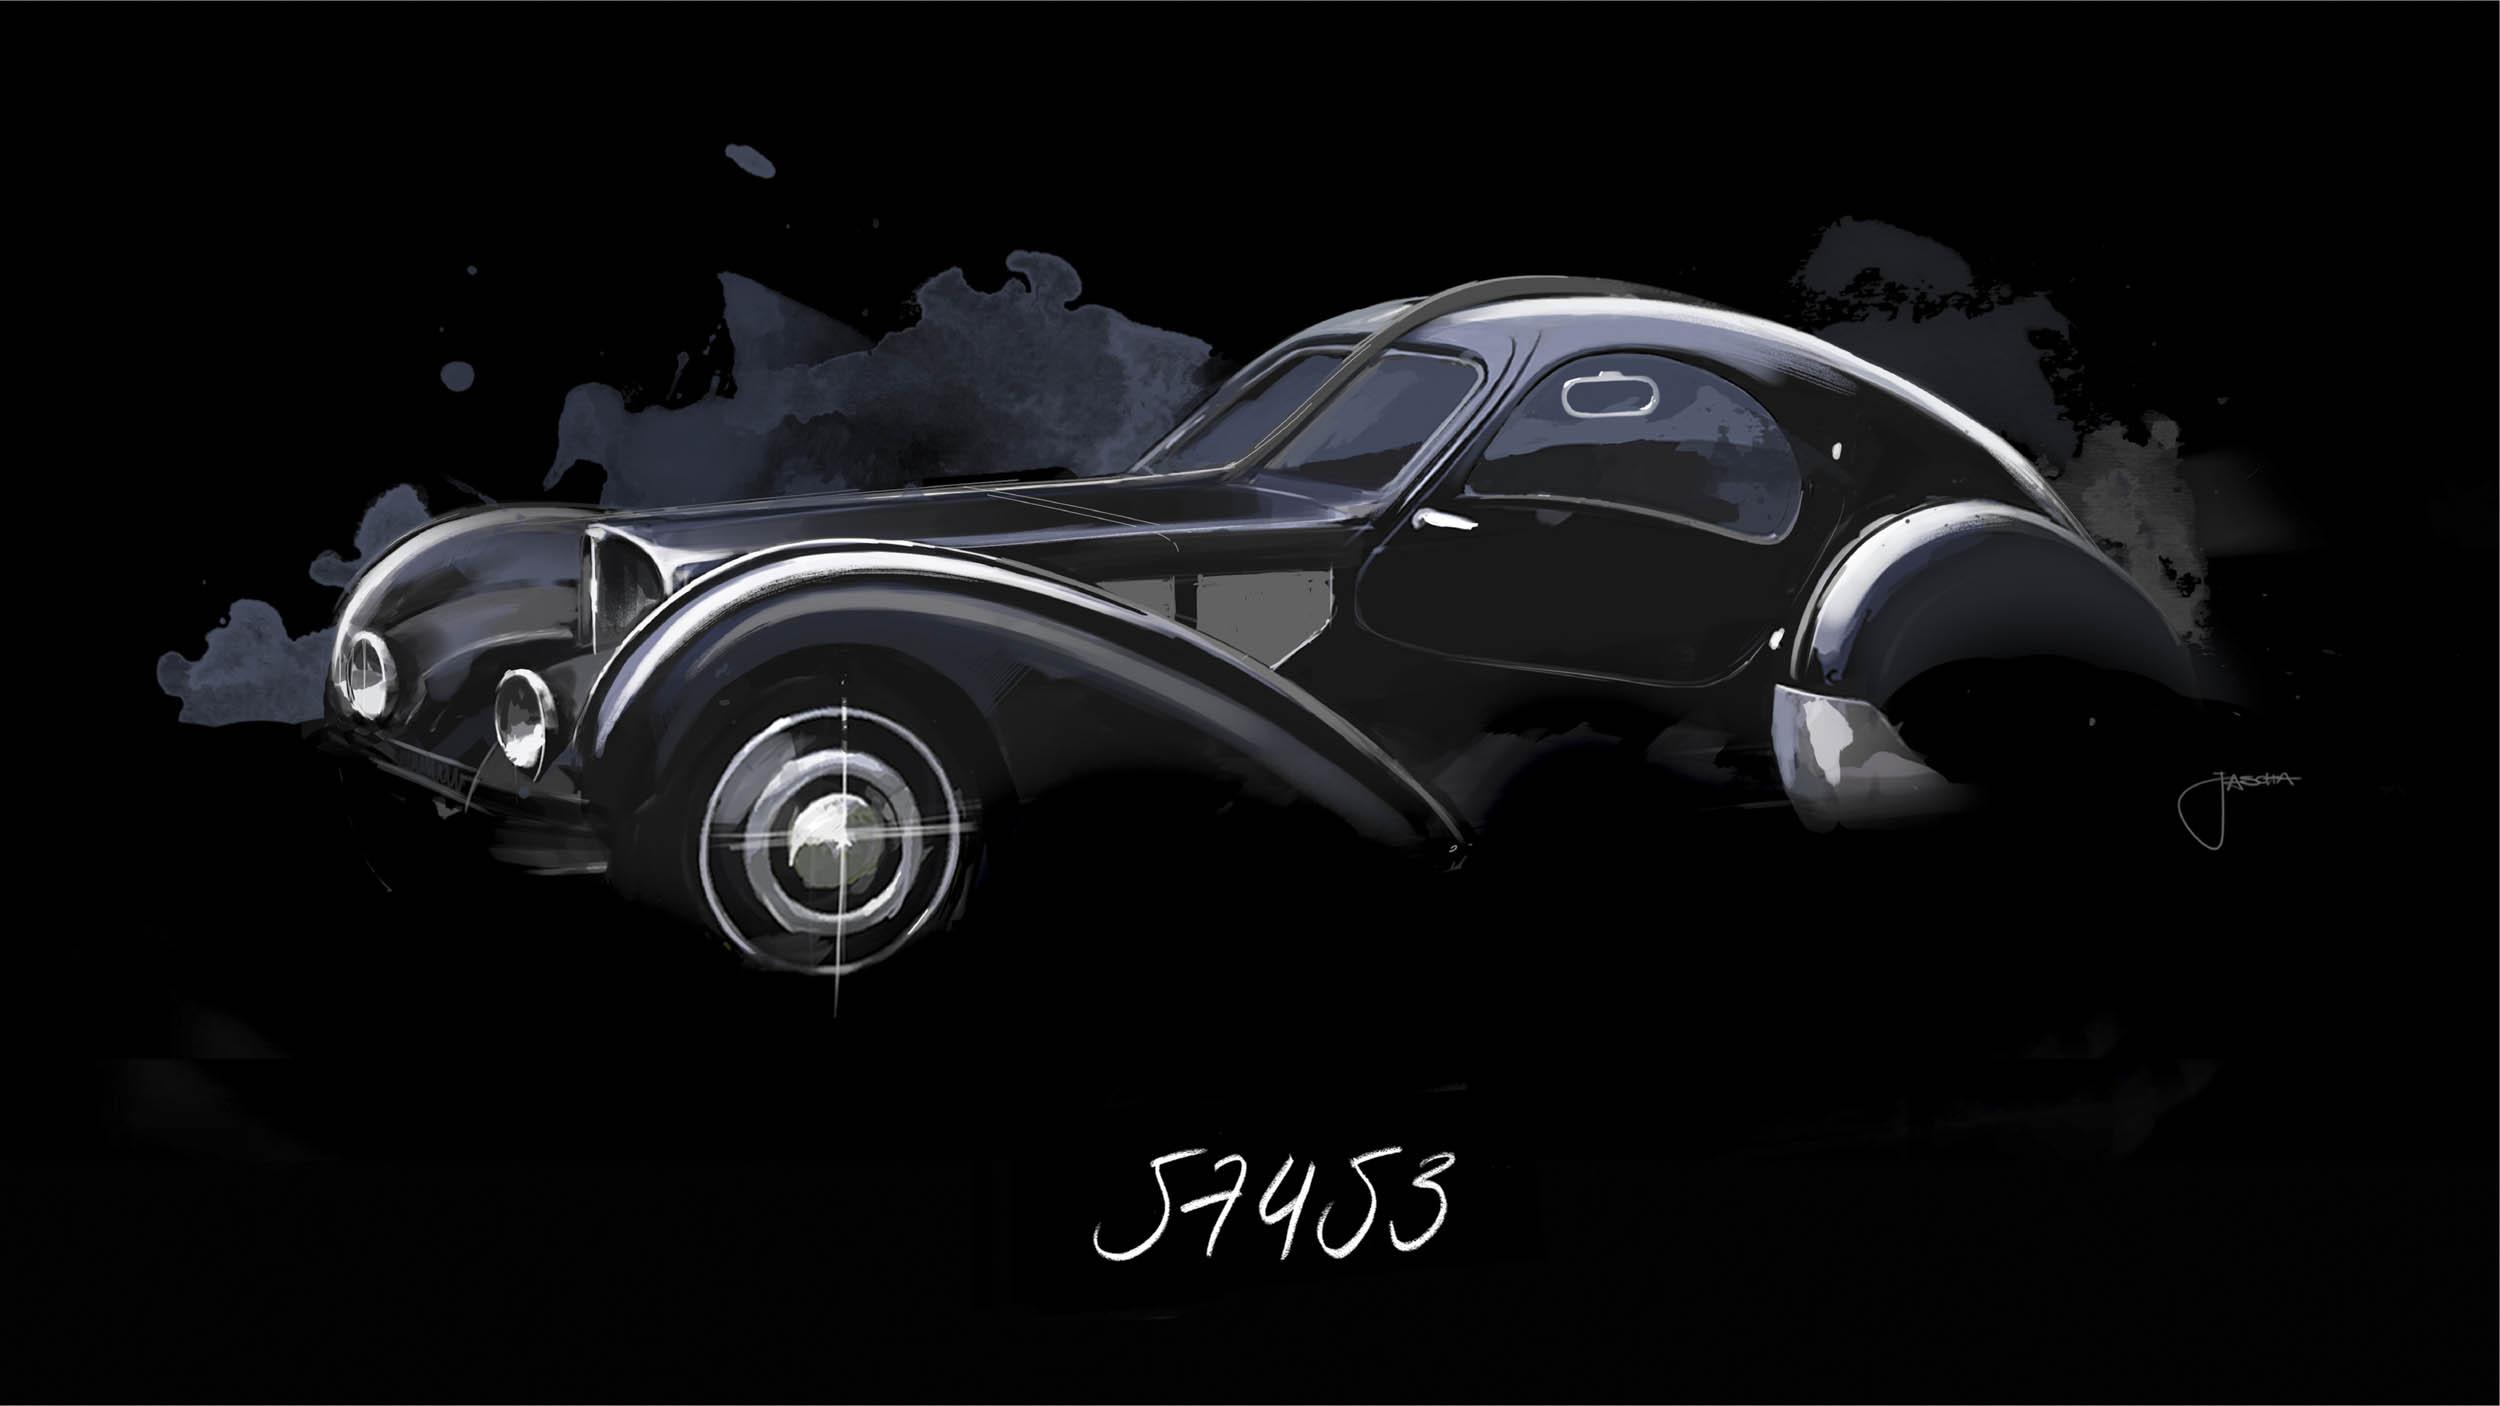 Bugatti Atlantic Chassis 57453, The Voiture Noire car